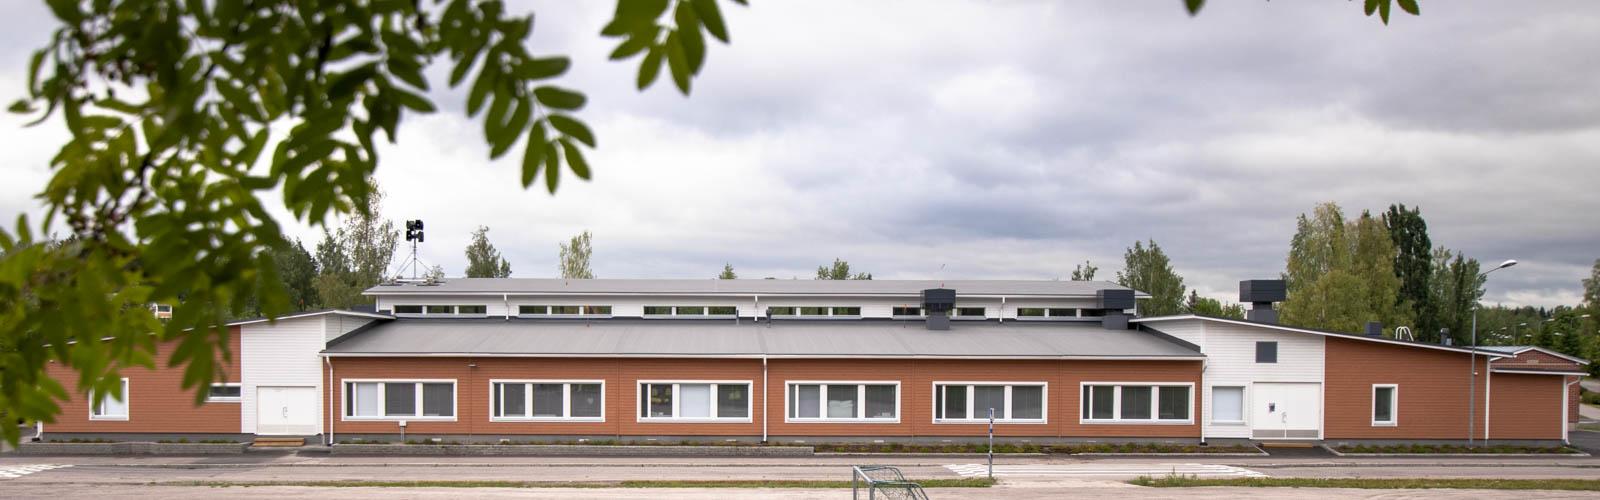 opetustilarakennus moduulikoulu